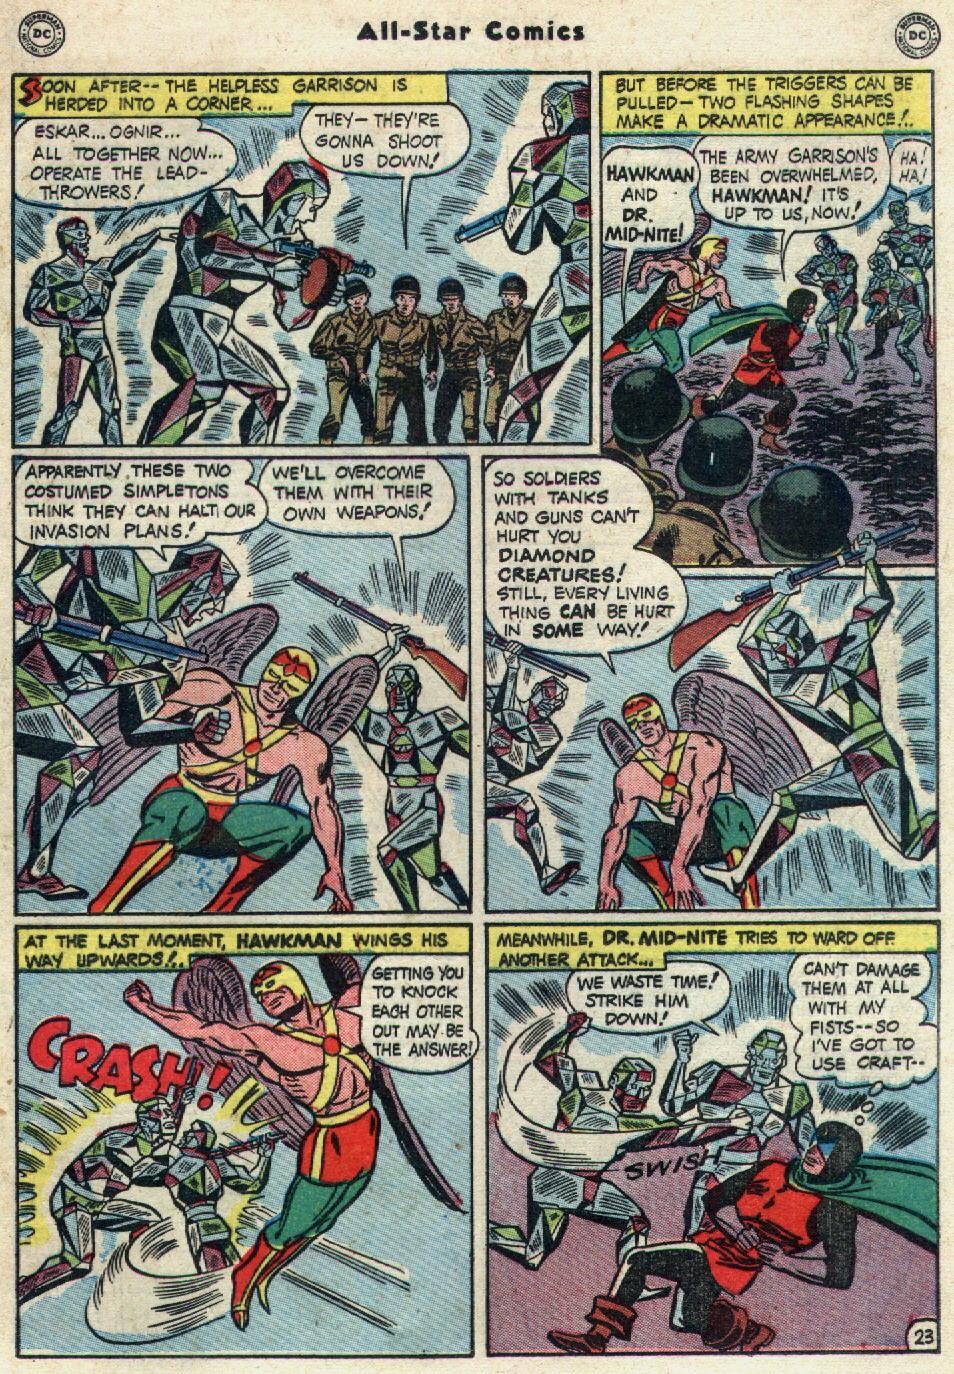 Read online All-Star Comics comic -  Issue #51 - 29